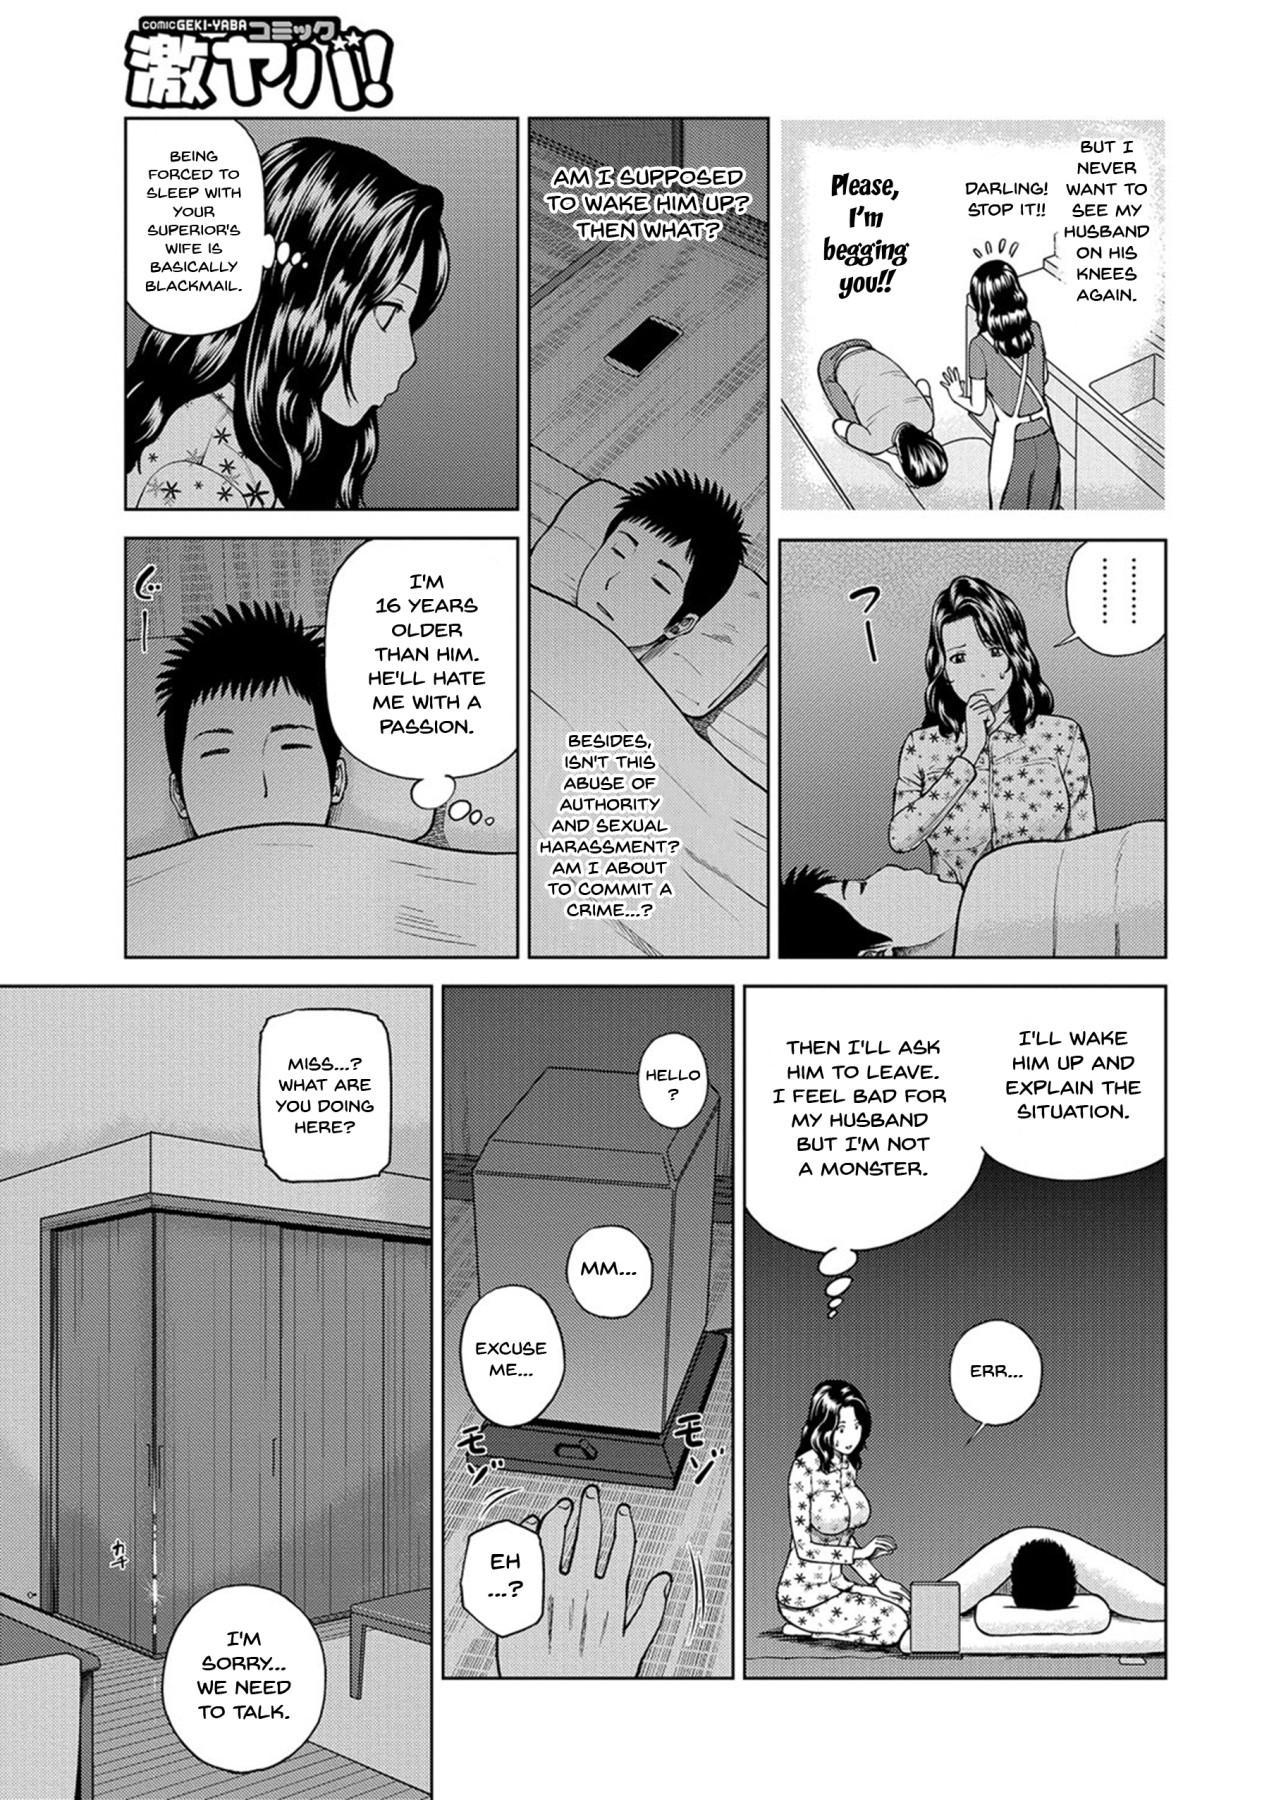 [Kuroki Hidehiko] Momojiri Danchi Mama-san Volley Doukoukai - Mom's Volley Ball | Momojiri District Mature Women's Volleyball Club Ch.1-9 [English] {Doujins.com} [Digital] 160